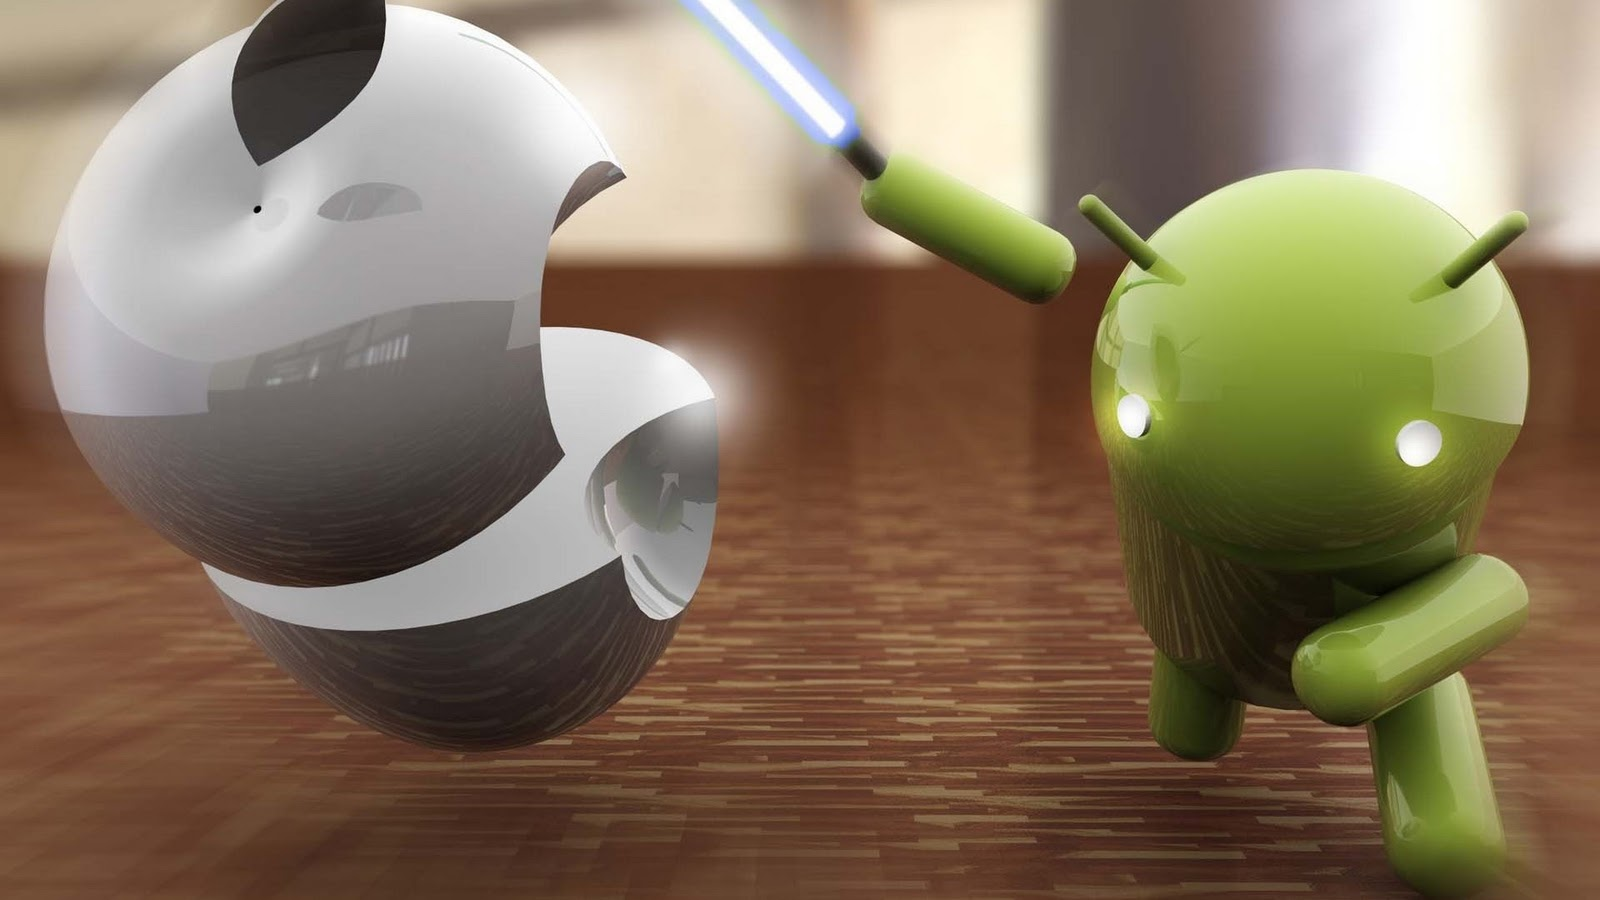 http://4.bp.blogspot.com/-dB__JhCPnRQ/Tr37dVtkCGI/AAAAAAAADuQ/B0TgNlE6VUE/s1600/Android-vs-Apple-Wallpaper.jpg